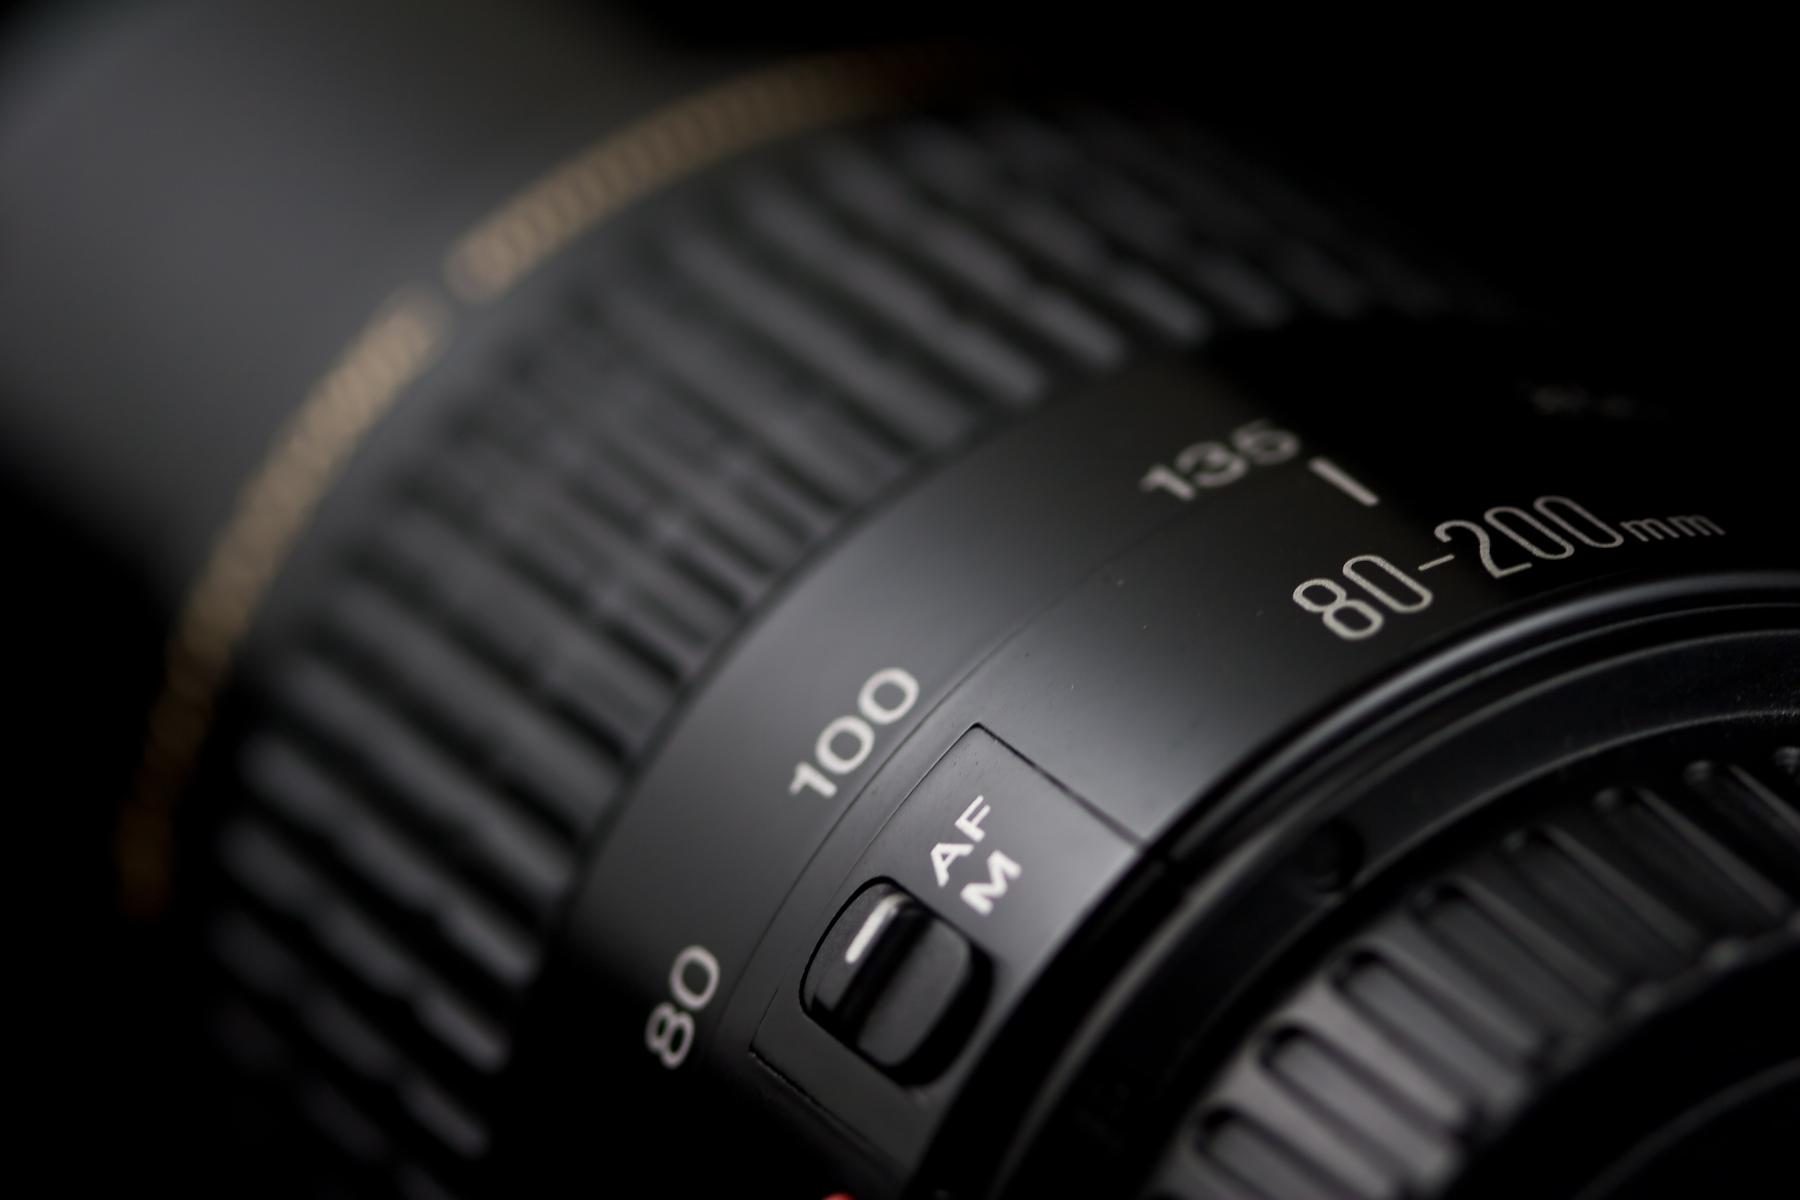 80-200mm lens closeup photo